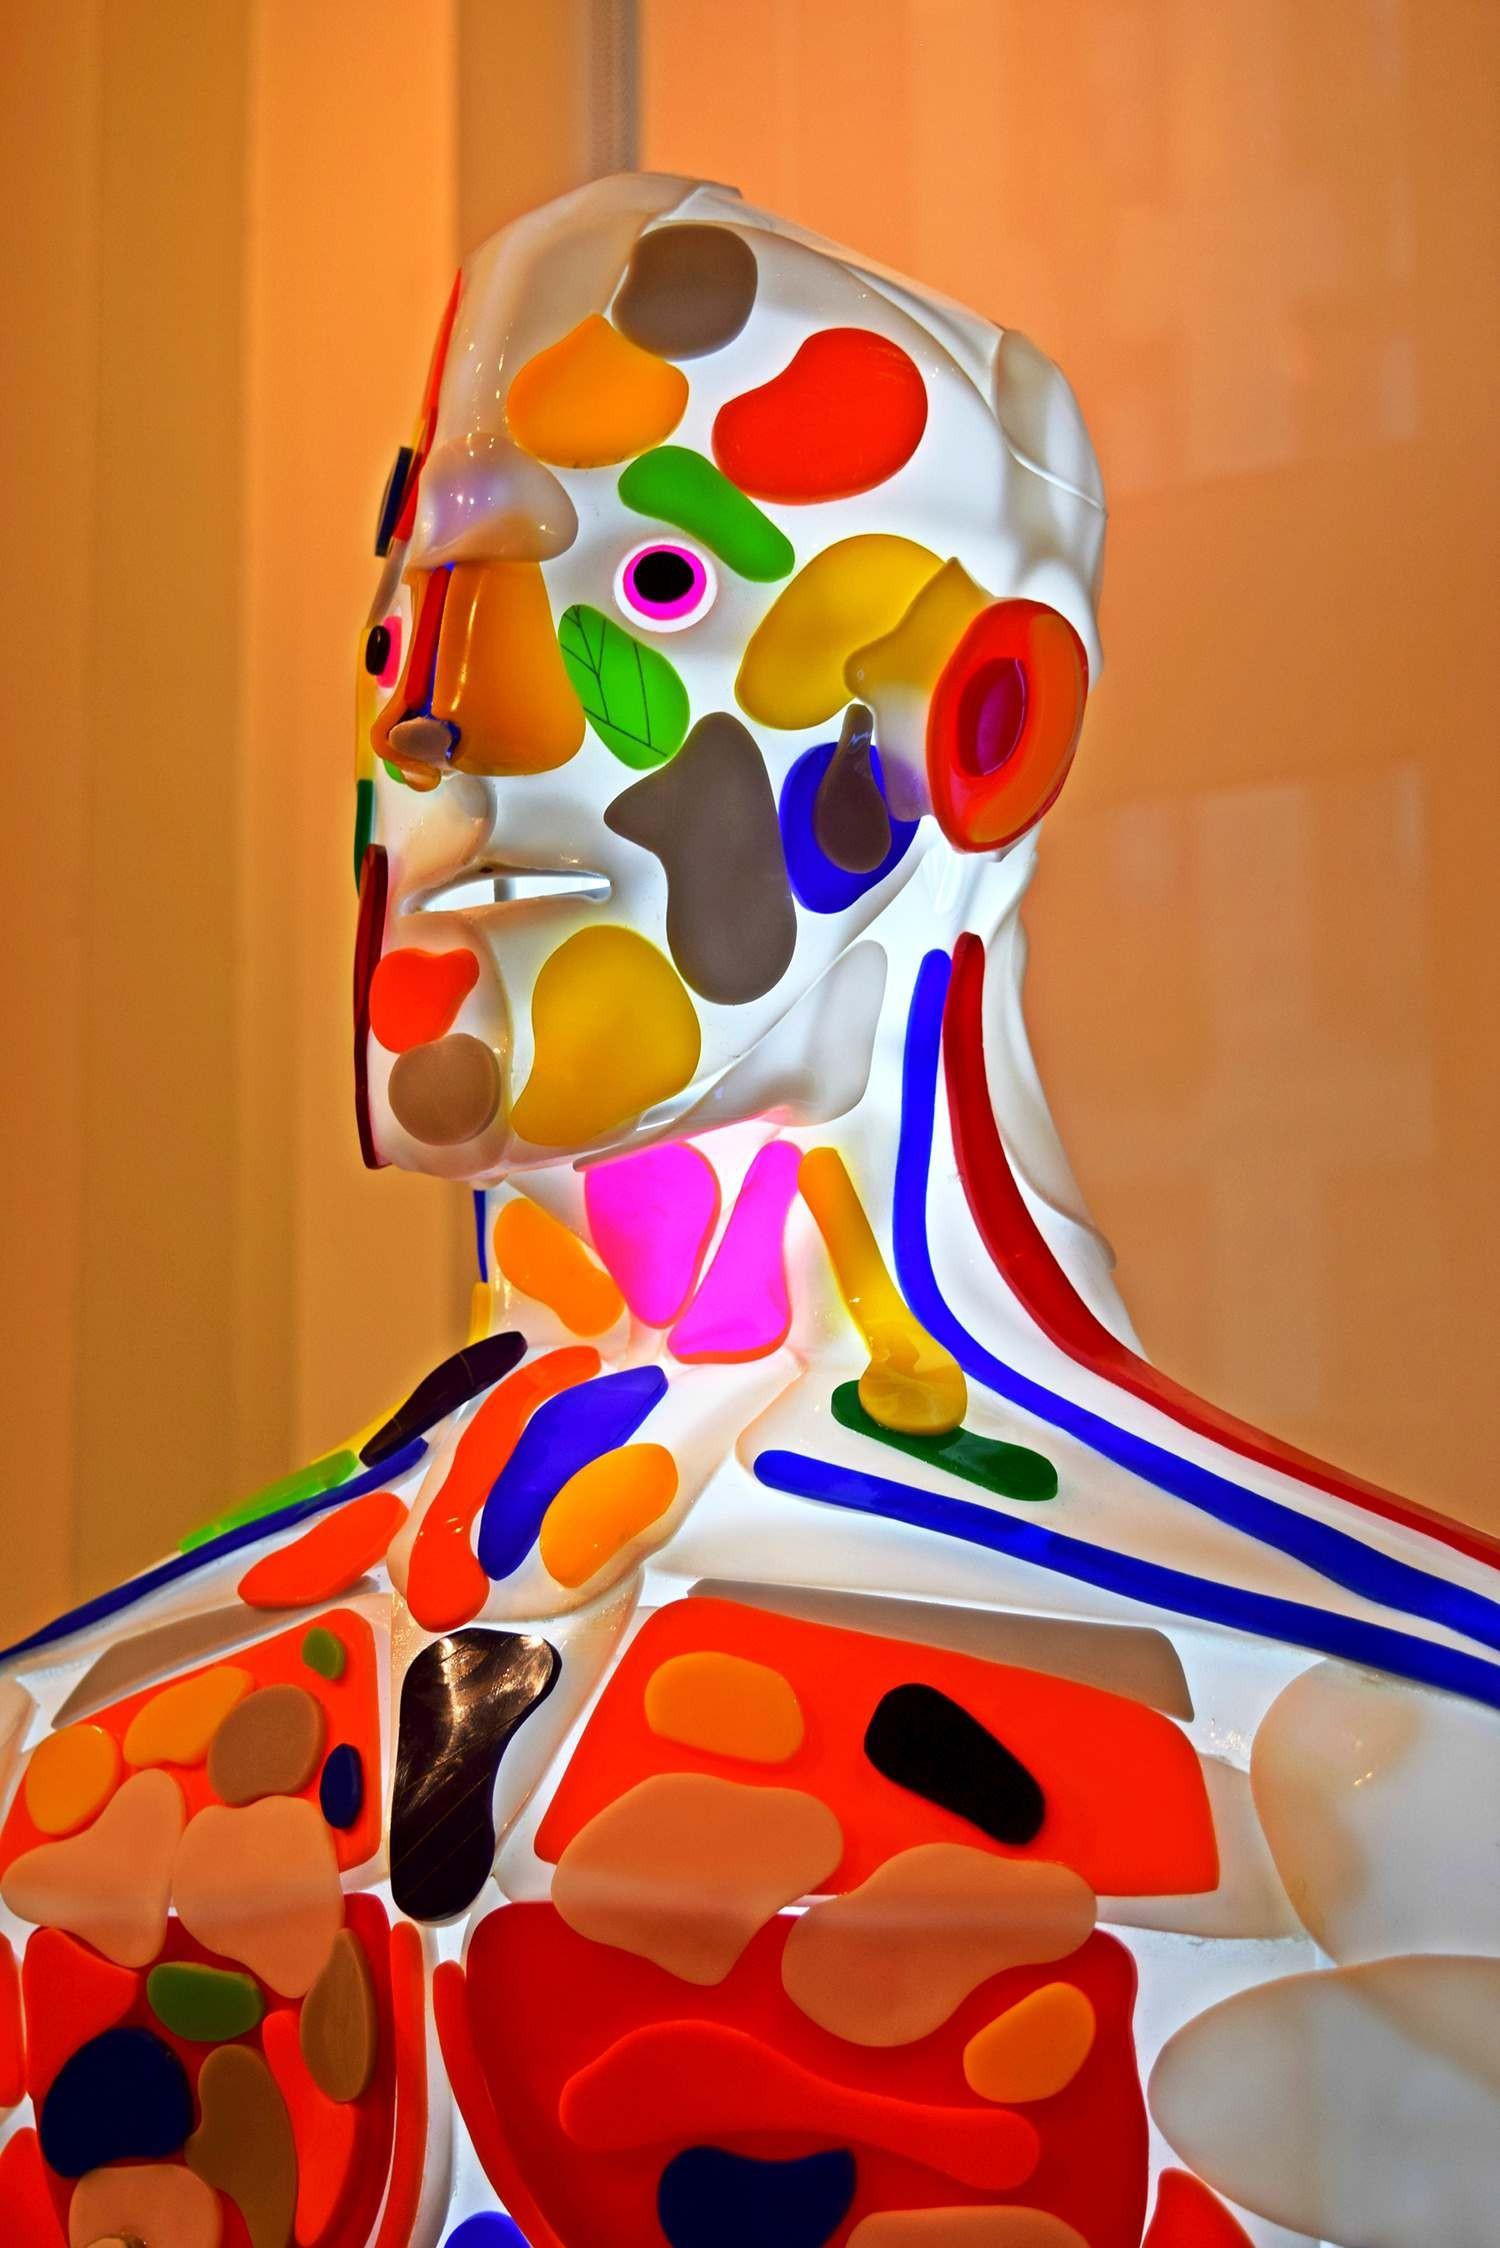 Enlightened man, light sculpture, half profile view